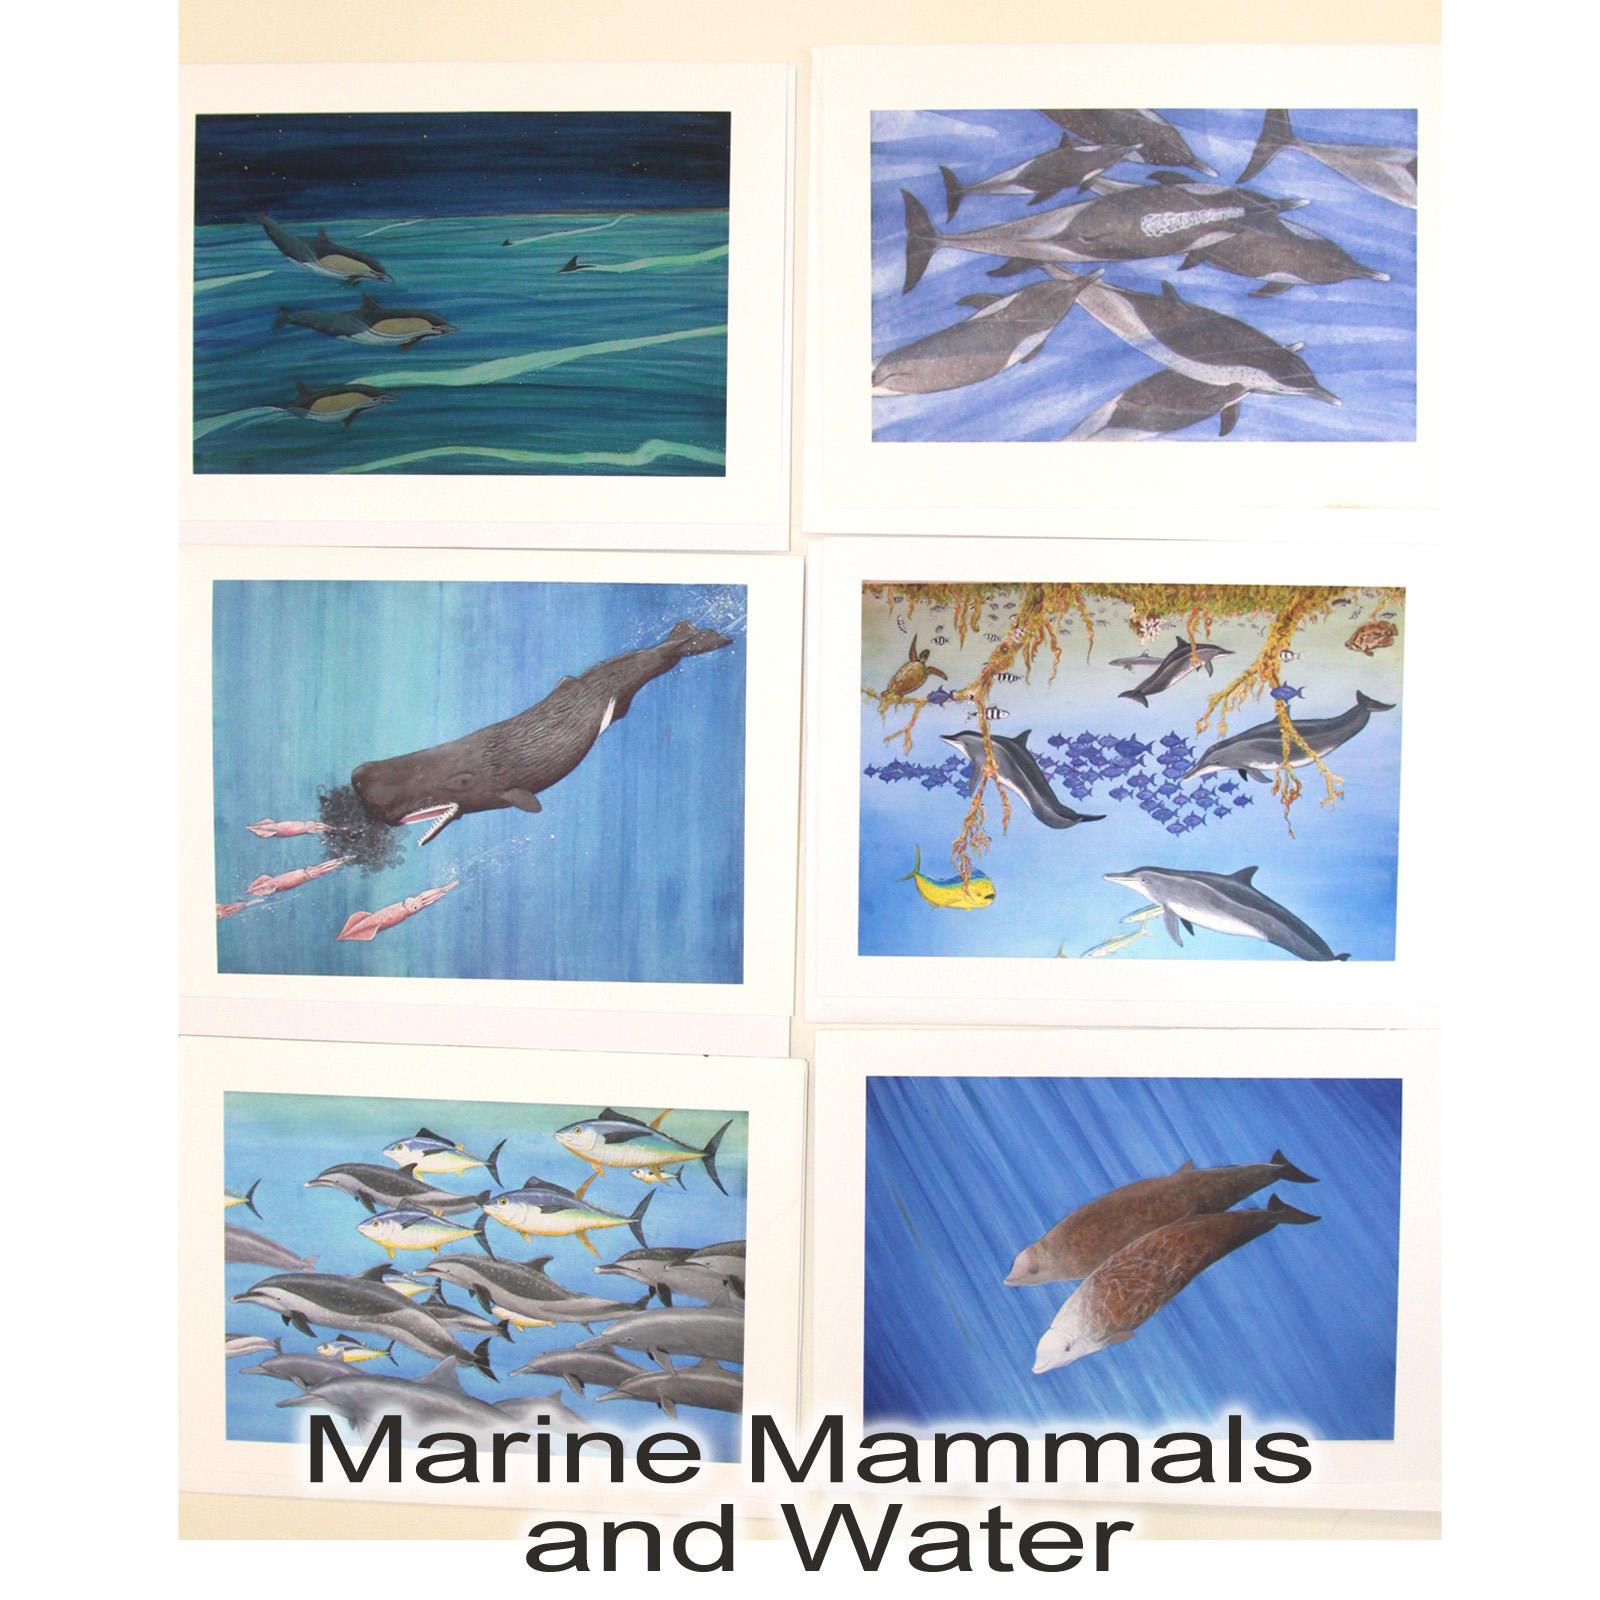 Marine mammals pictures - photo#26